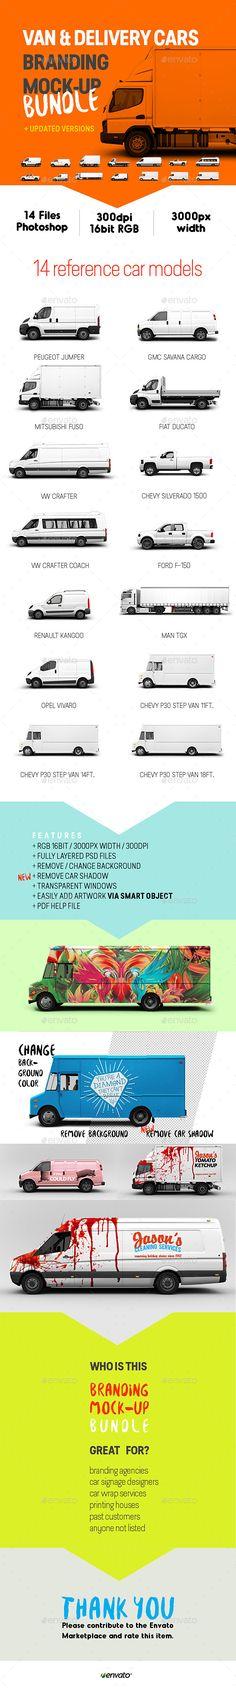 Van & Delivery Cars Branding Mockup Bundle - Vehicle Wraps Print                                                                                                                                                     Mais